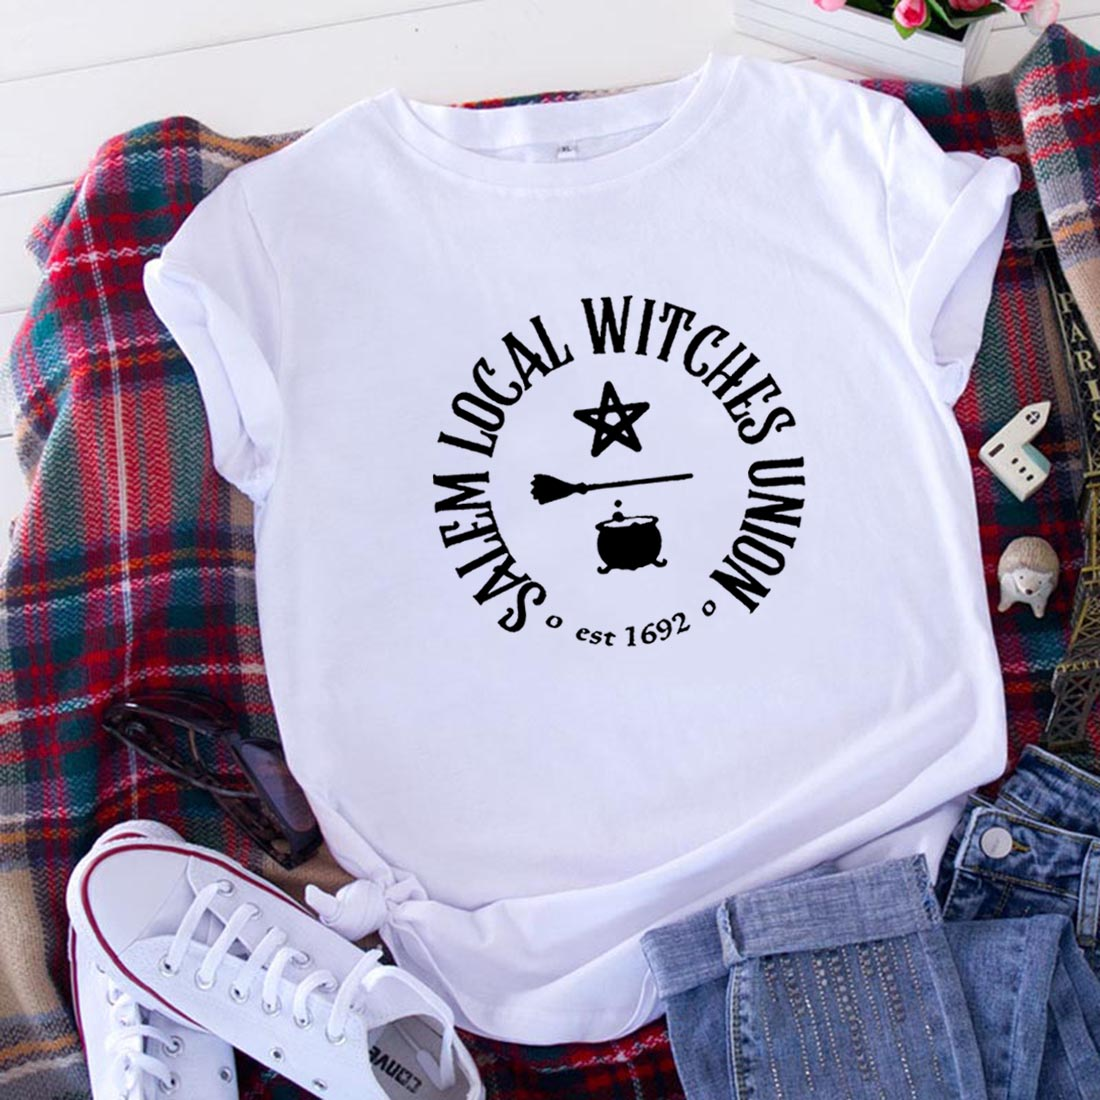 Camiseta de manga corta de algodón para Mujer, blusa holgada informal de...